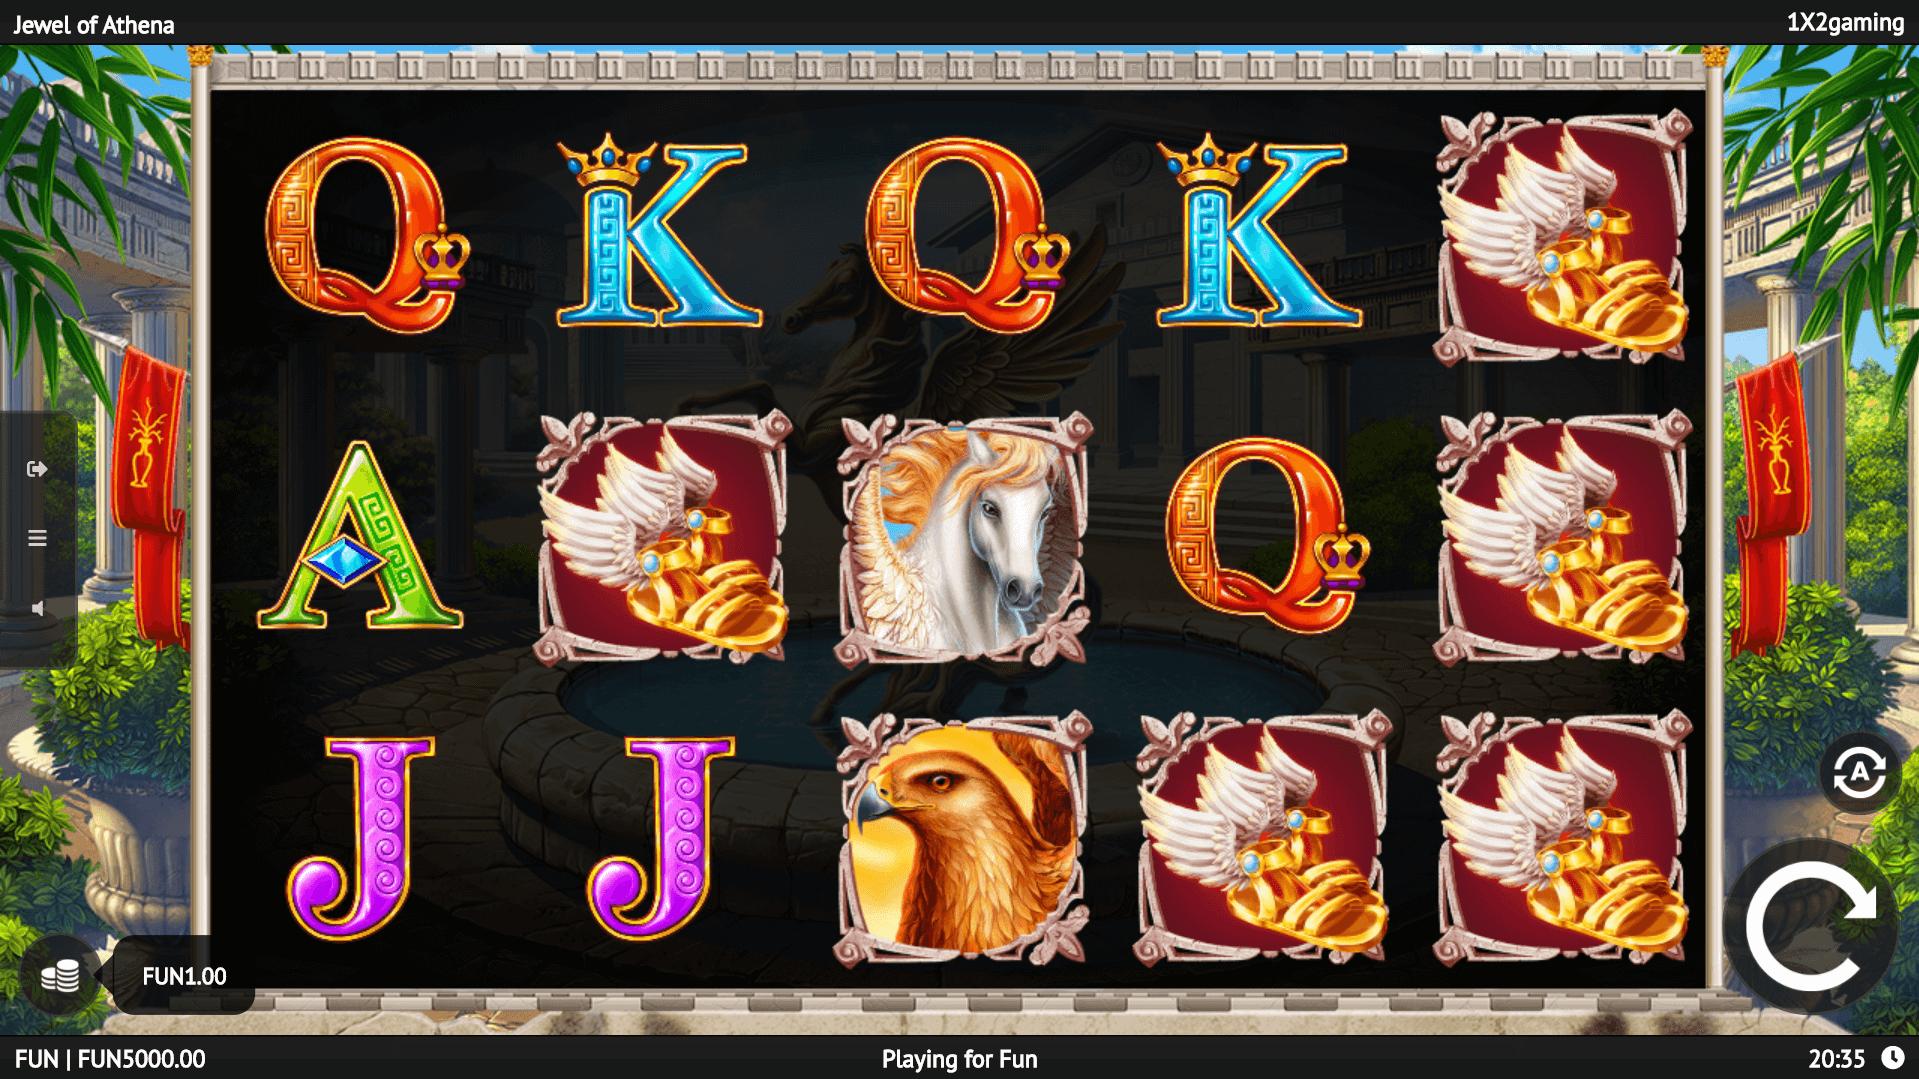 Jewel of Athena slot machine screenshot